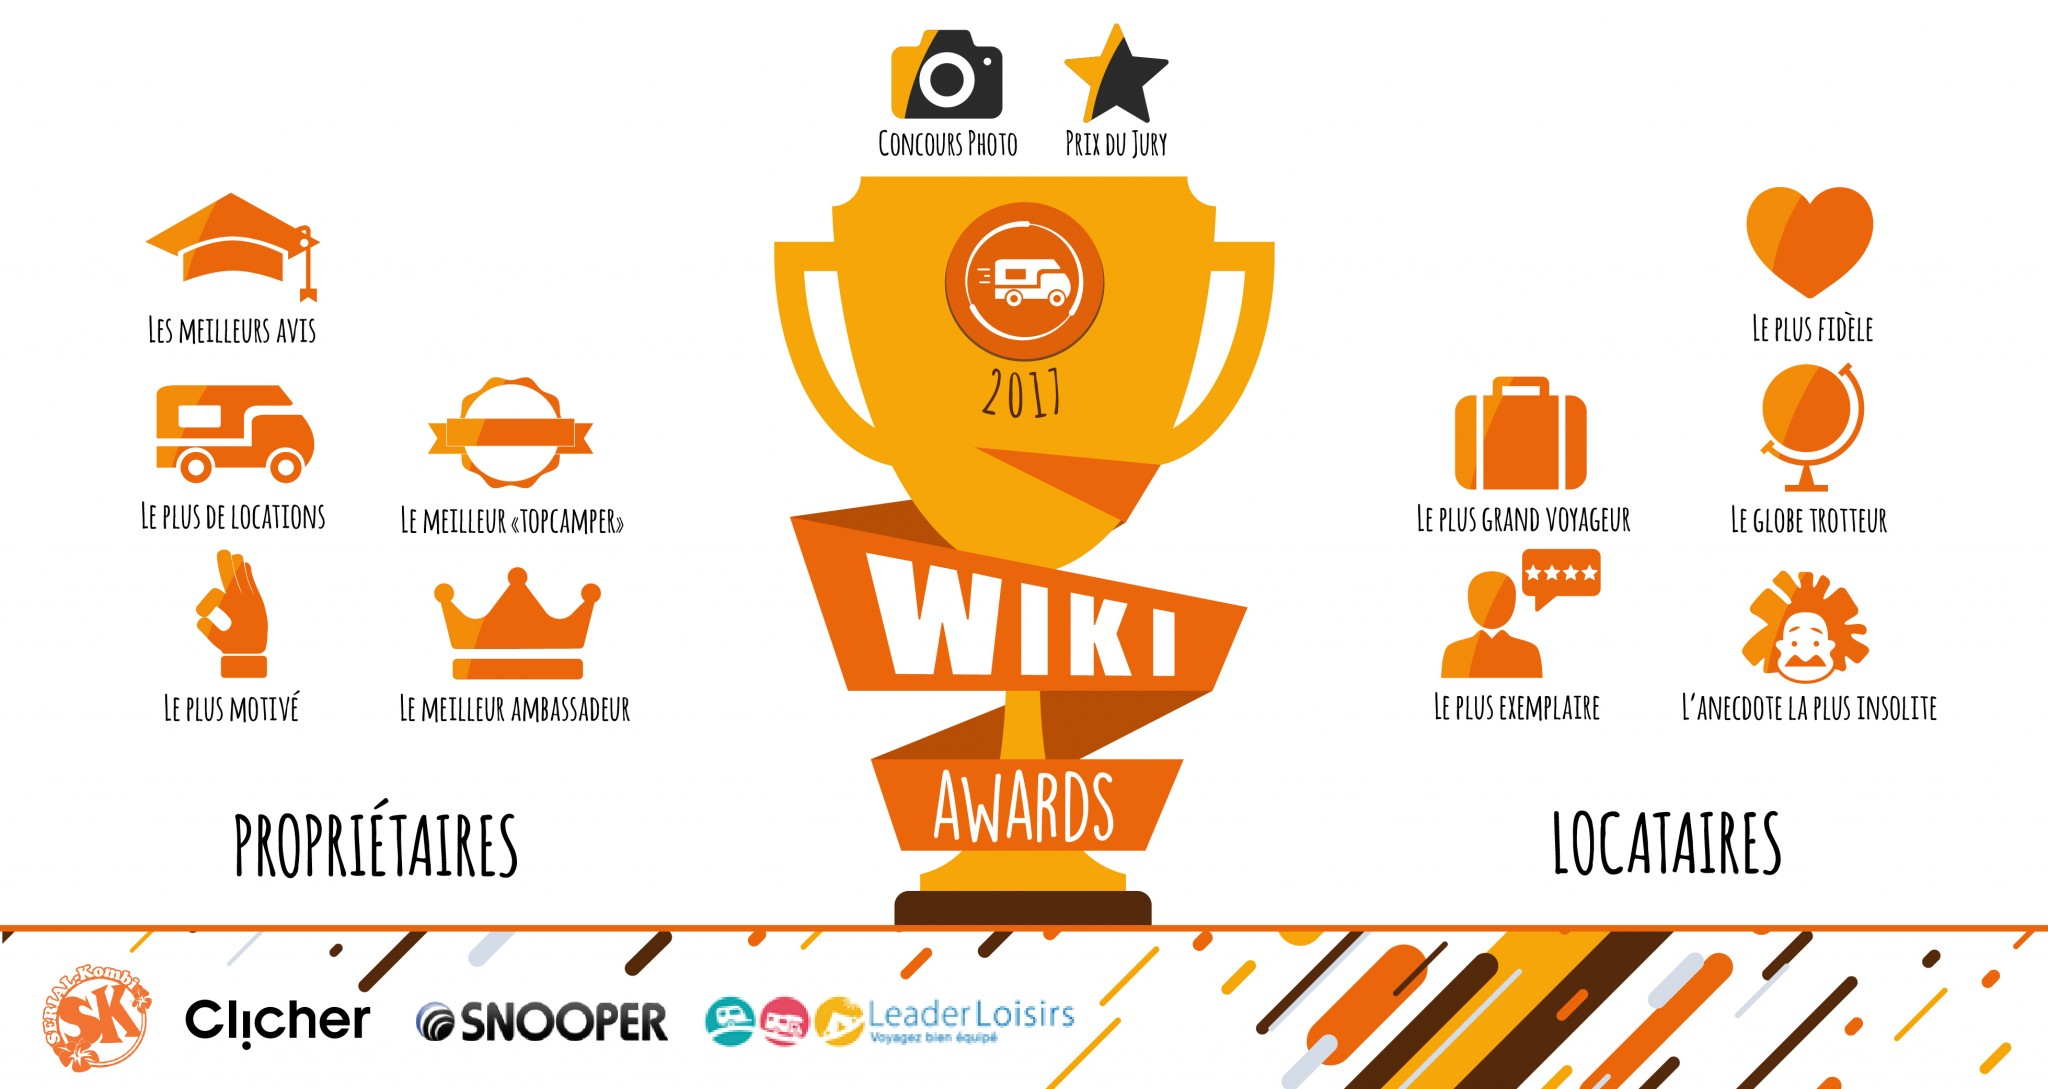 WIKI AWARDS 2017